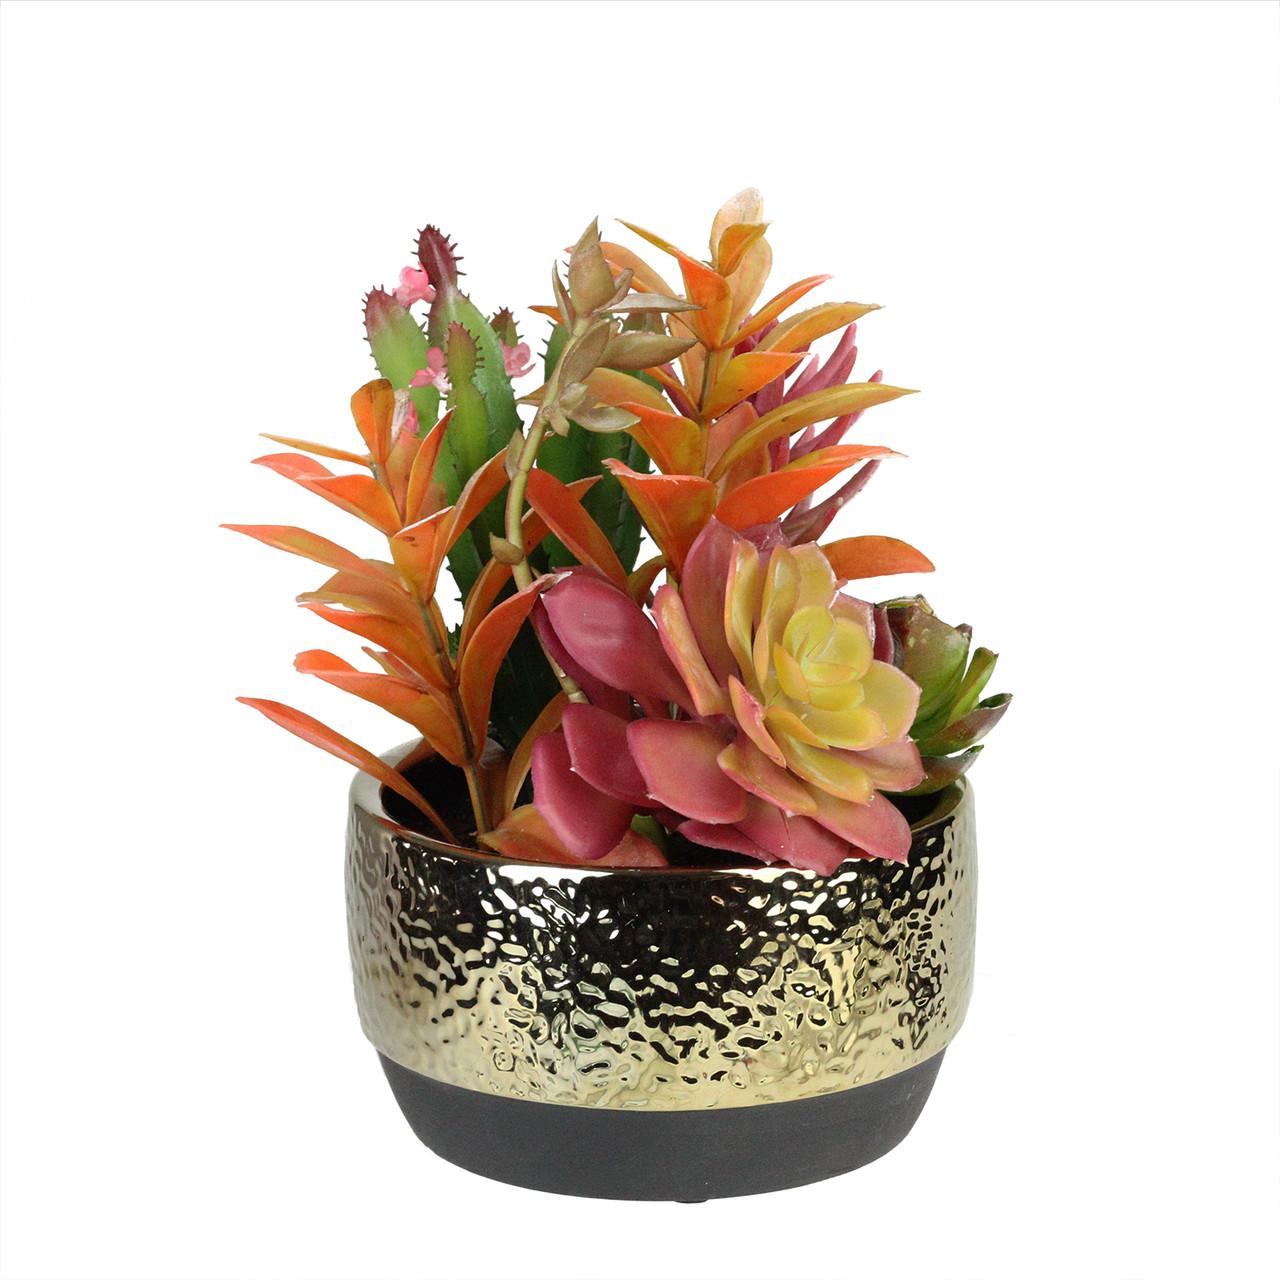 8 5 Artificial Succulent Arrangement In Gold Ceramic Pot Christmas Central